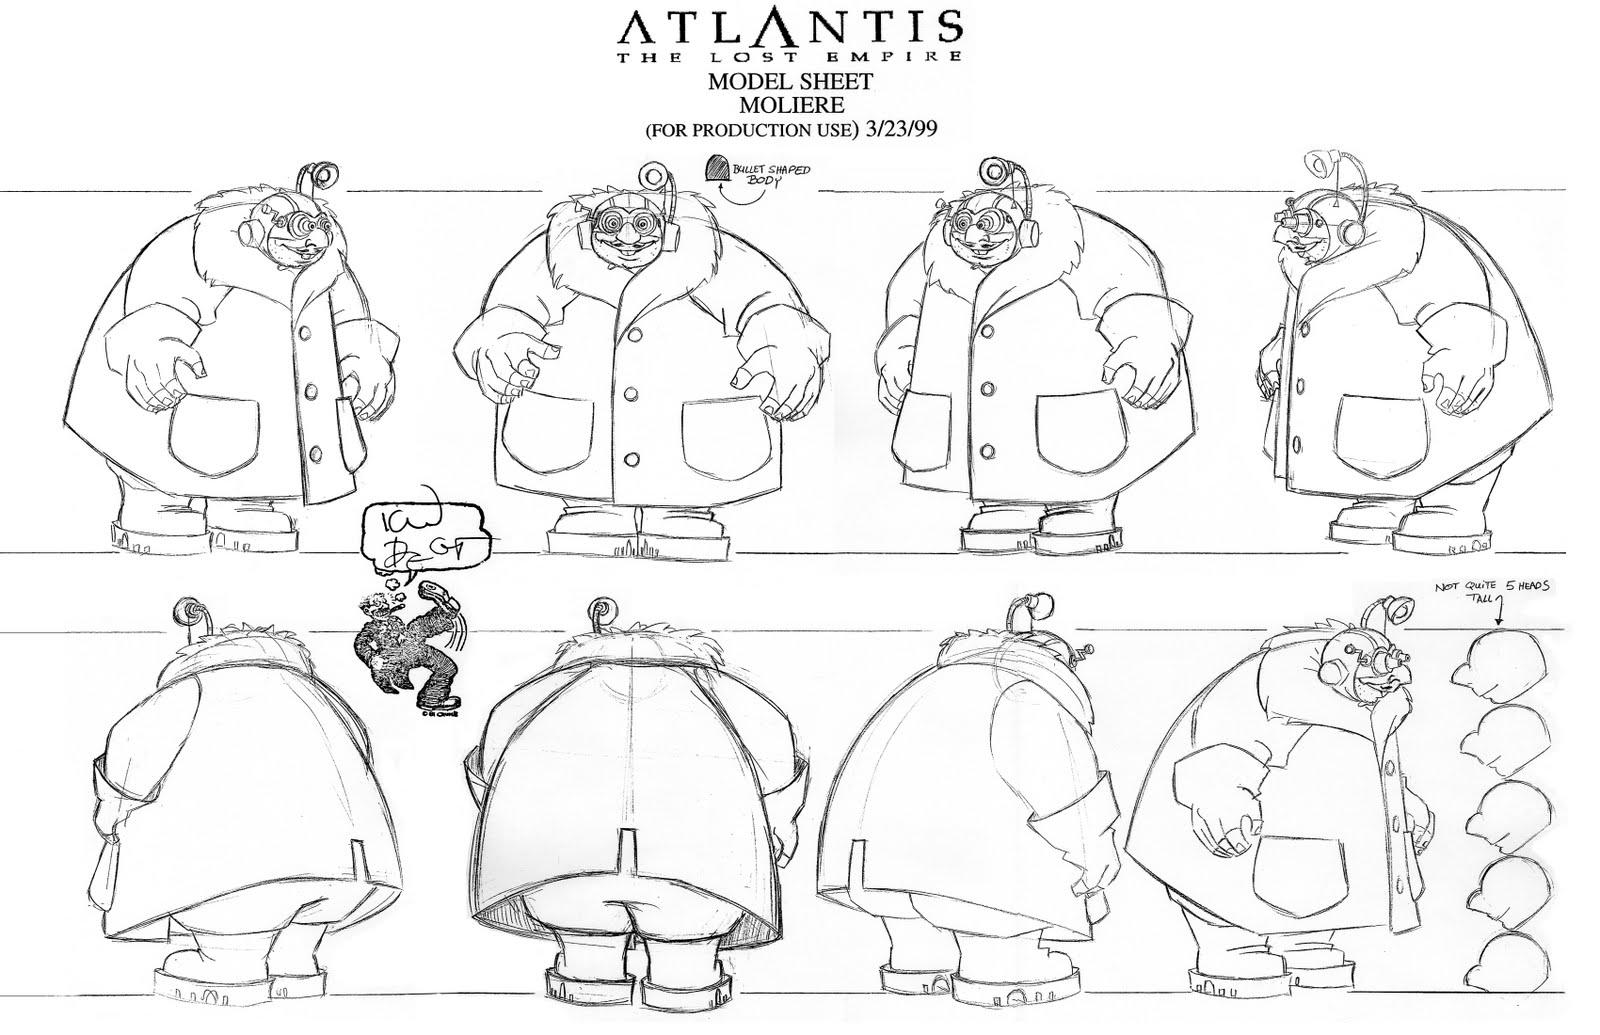 AtlantisModelSheet21